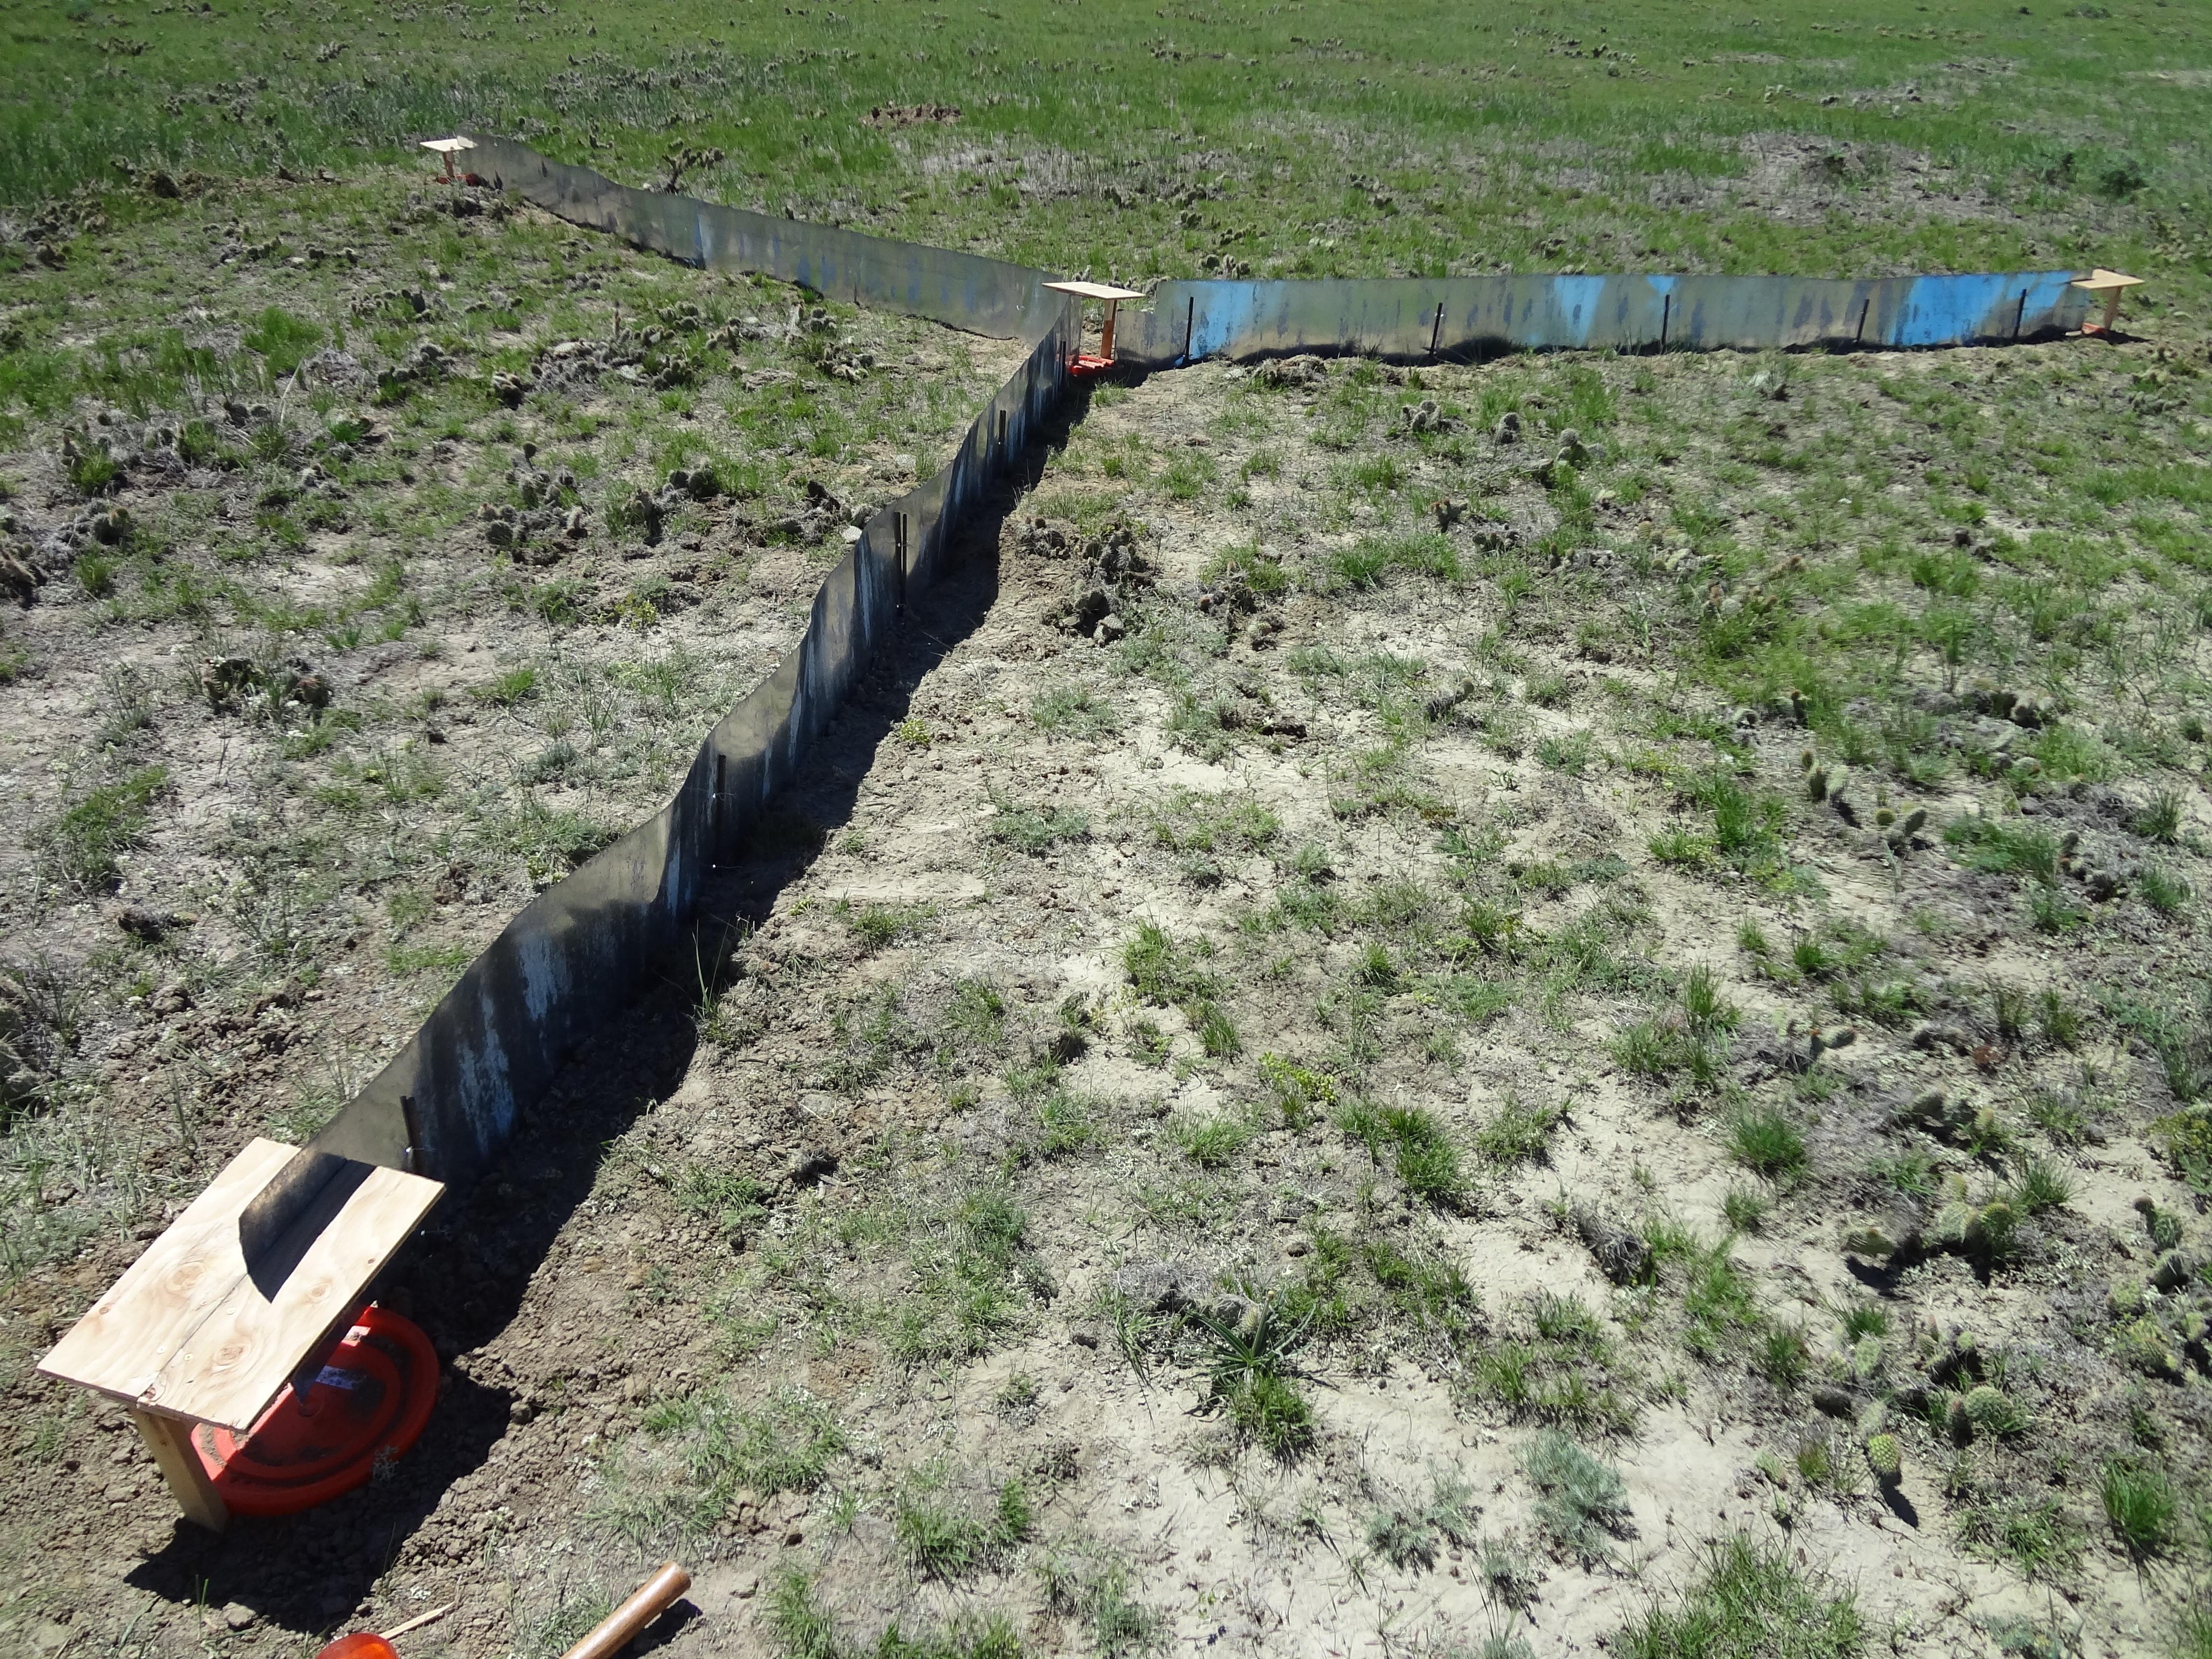 Pitfall trap array, Thunder Basin National Grassland, WY